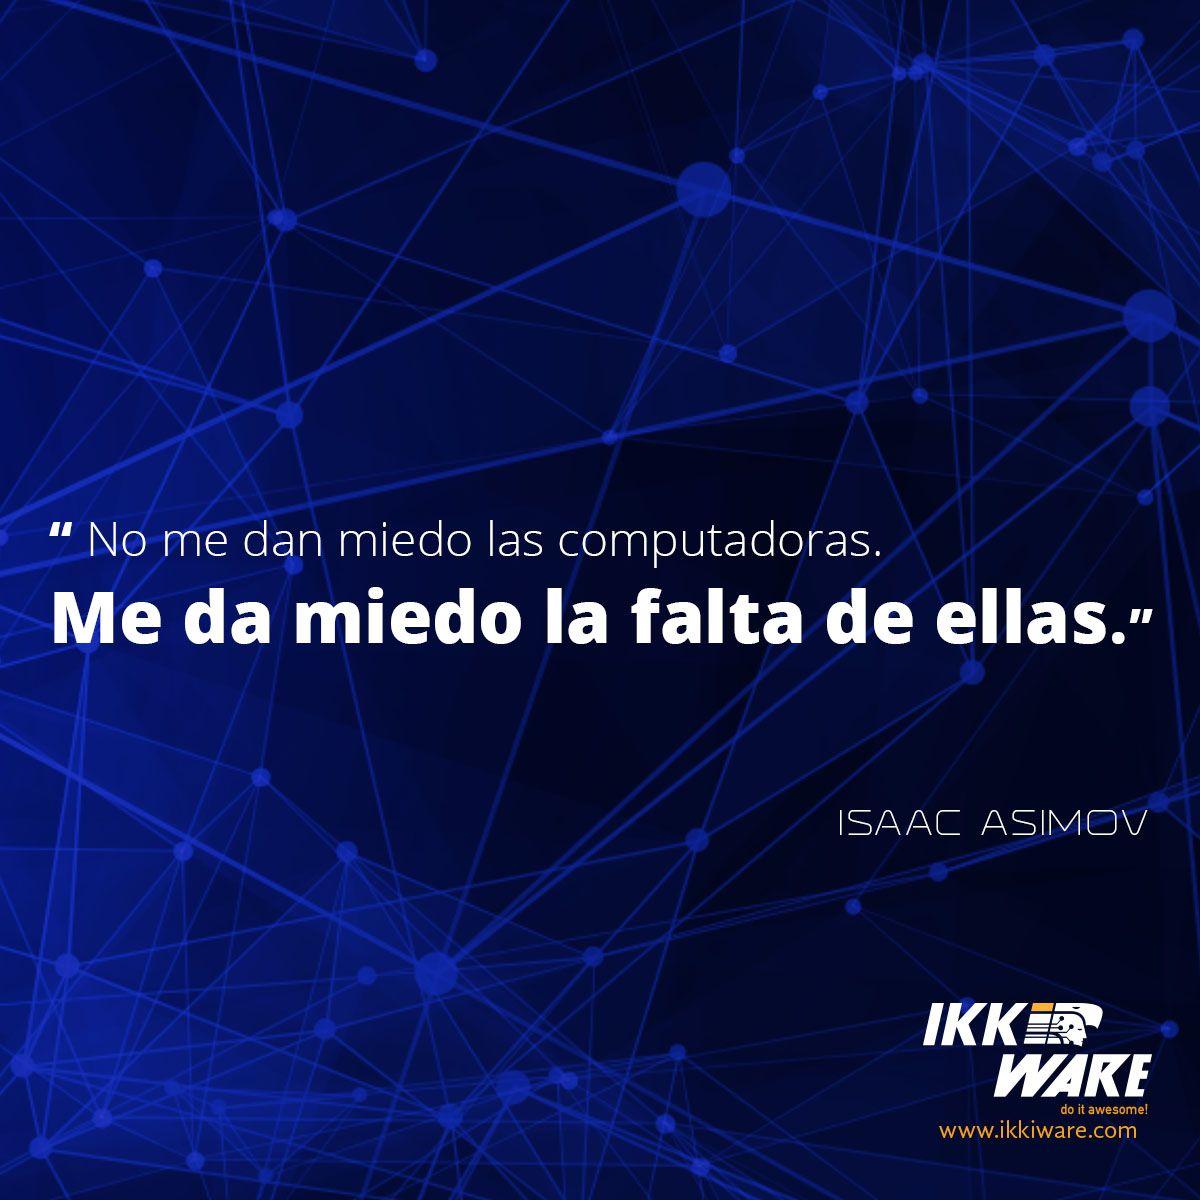 IKKIWARE_ES #Ikkiware #frases #programación